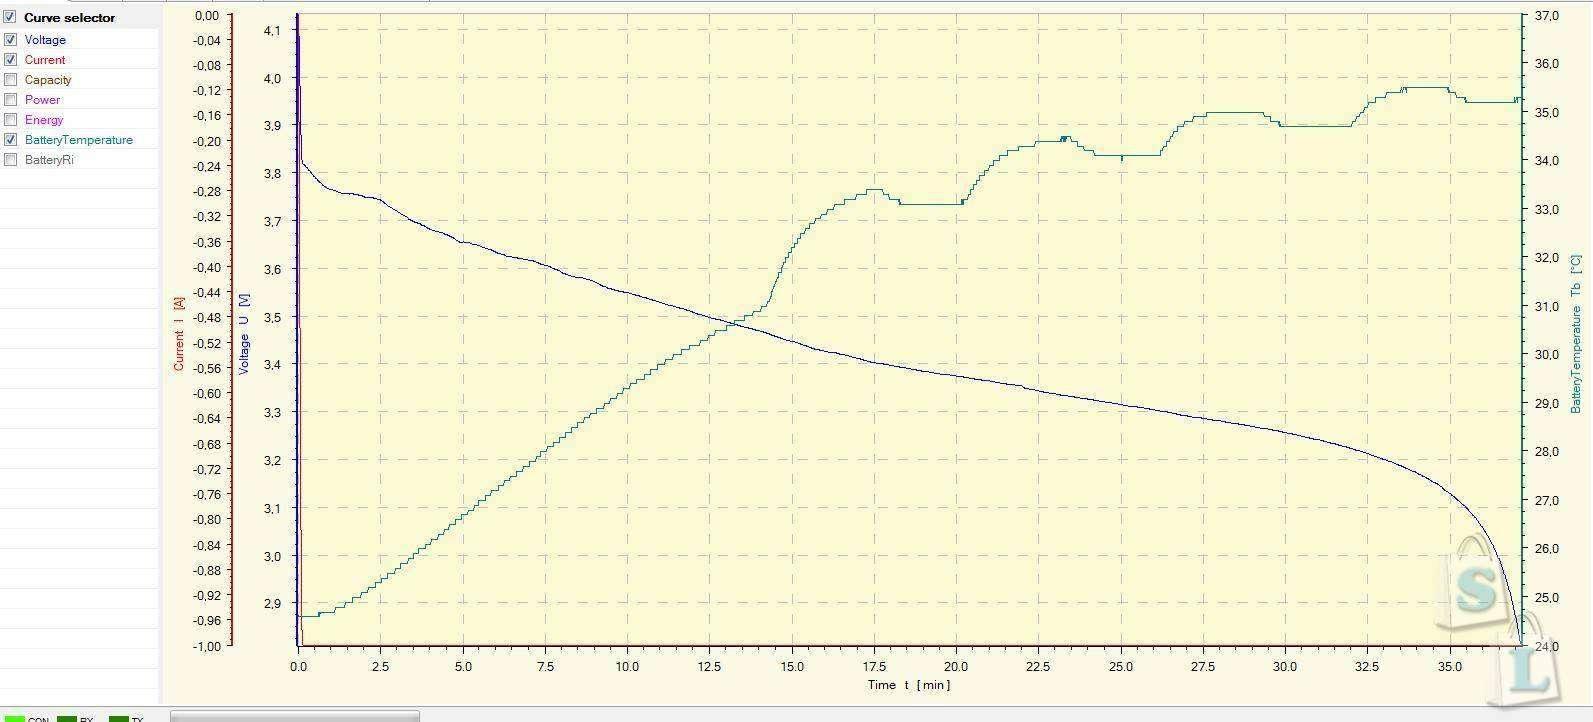 Banggood: Обзор Li-ion аккумулятора KeepPower 14500 800mAh с защитой